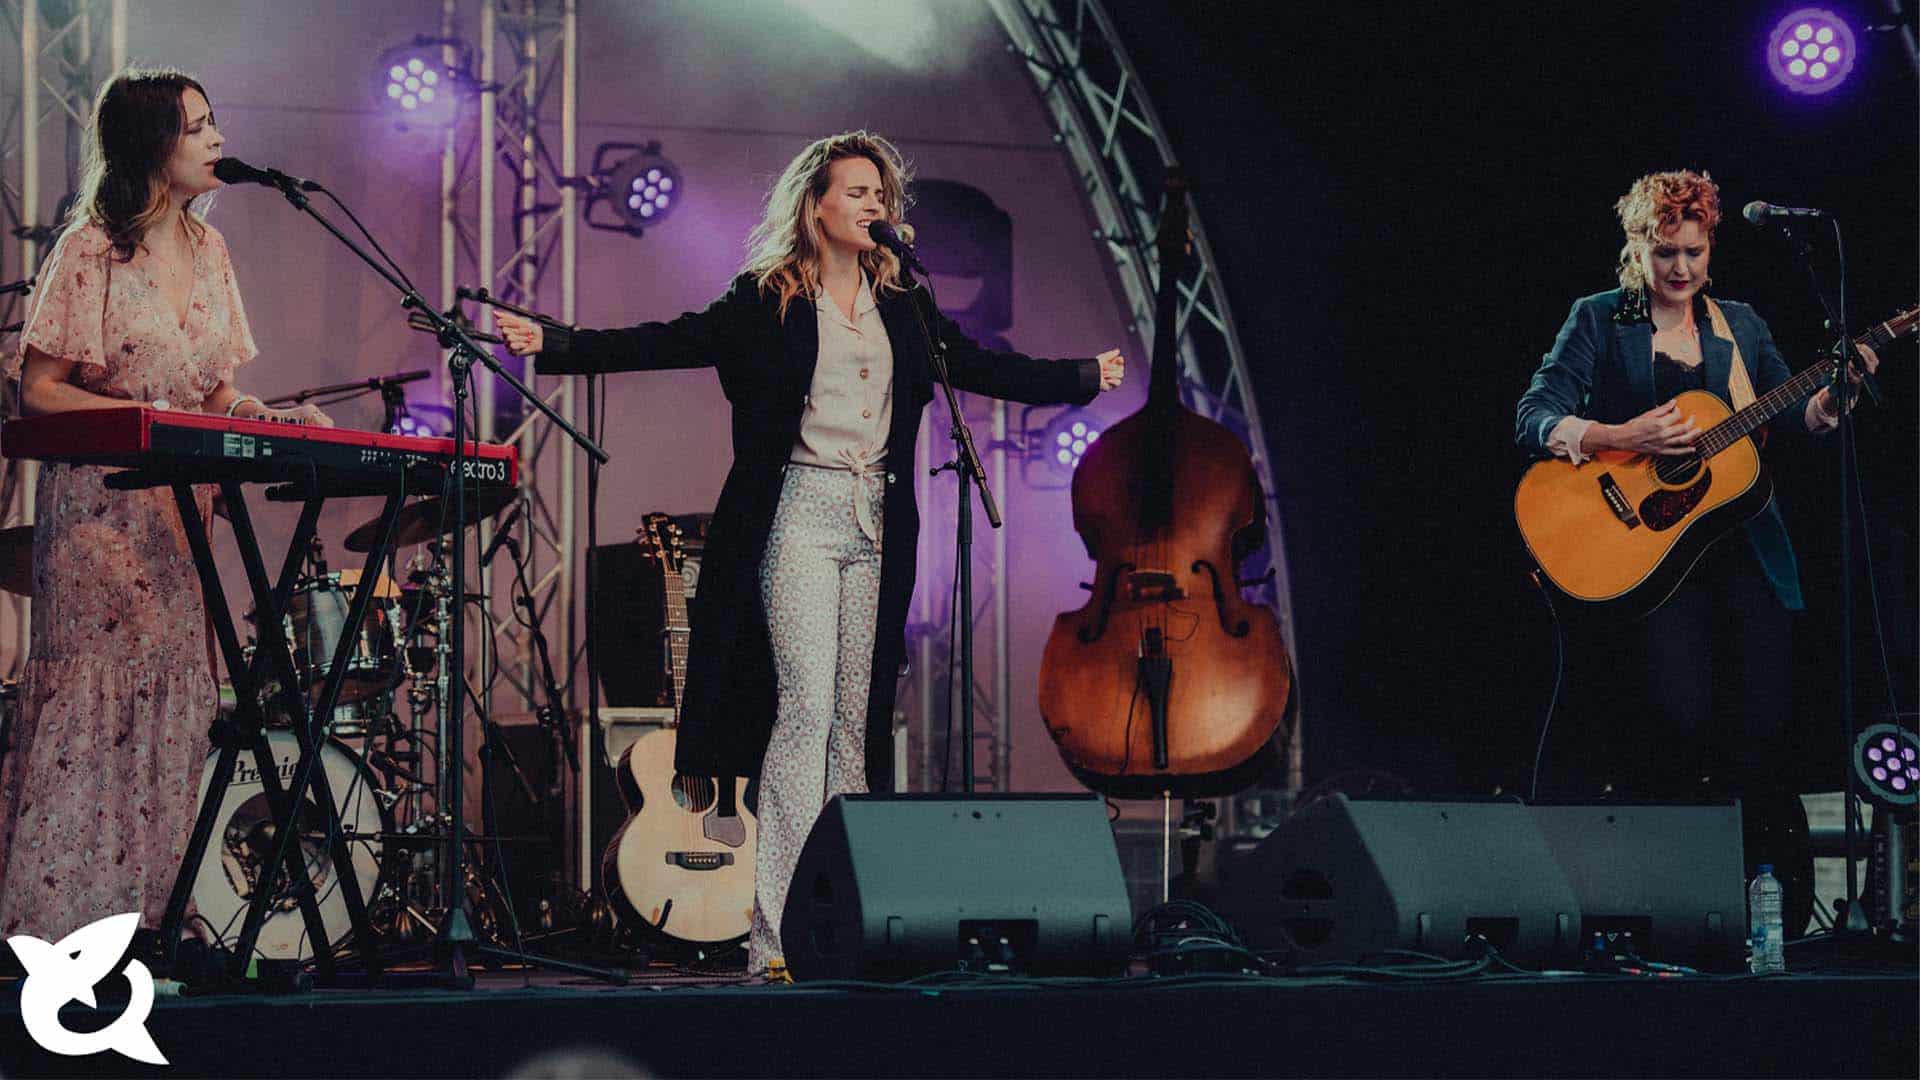 The BlueBirds + Leonie Meijer LIVE - Fotograaf Sharik Derksen - McSharq_web